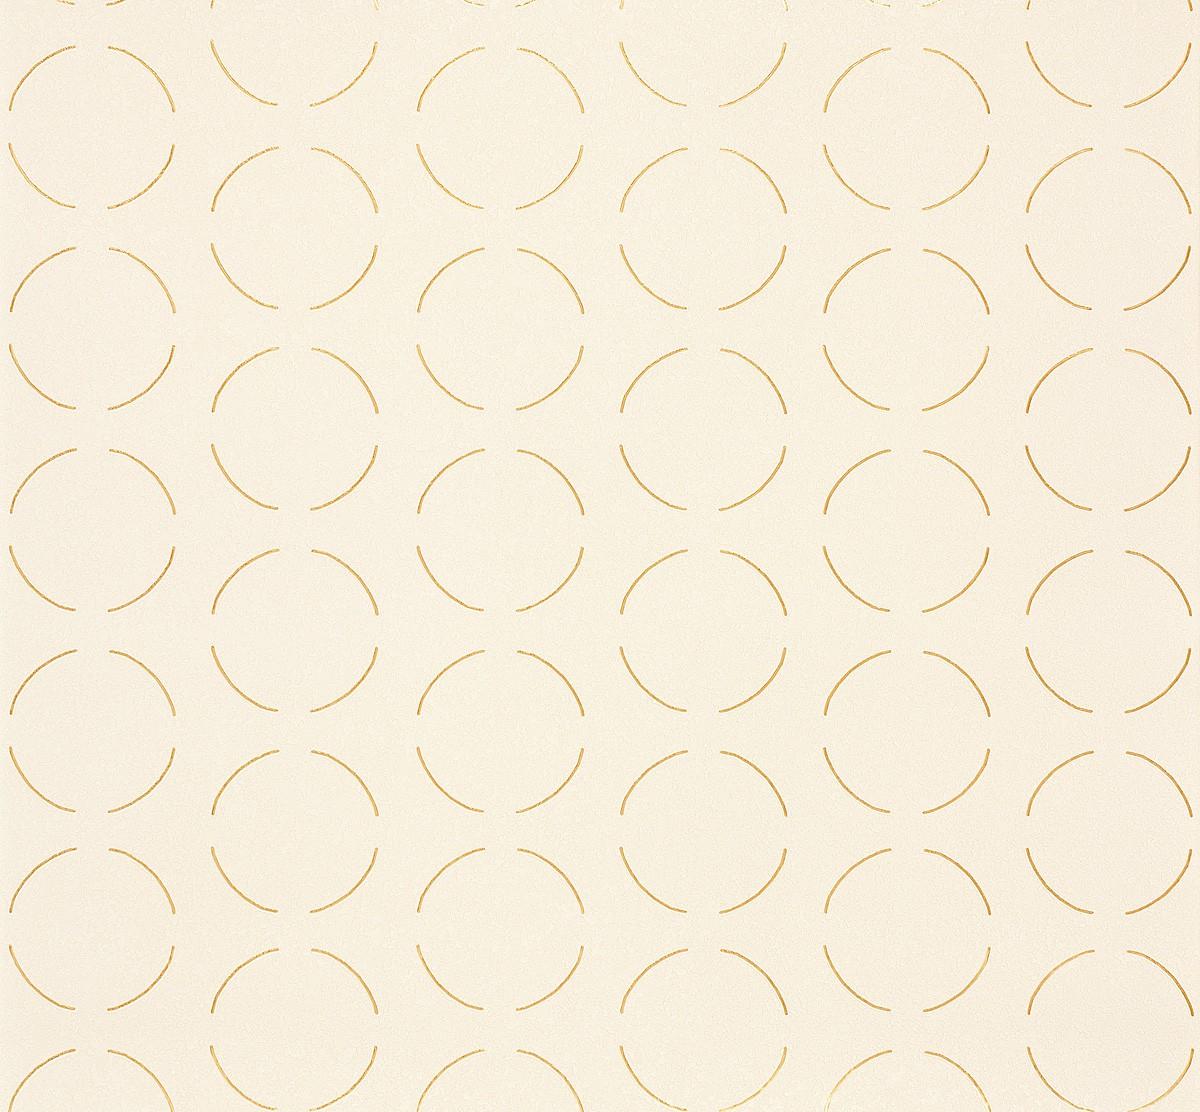 Porsche design tapete gold grafik 96064 1 for Design tapete gold